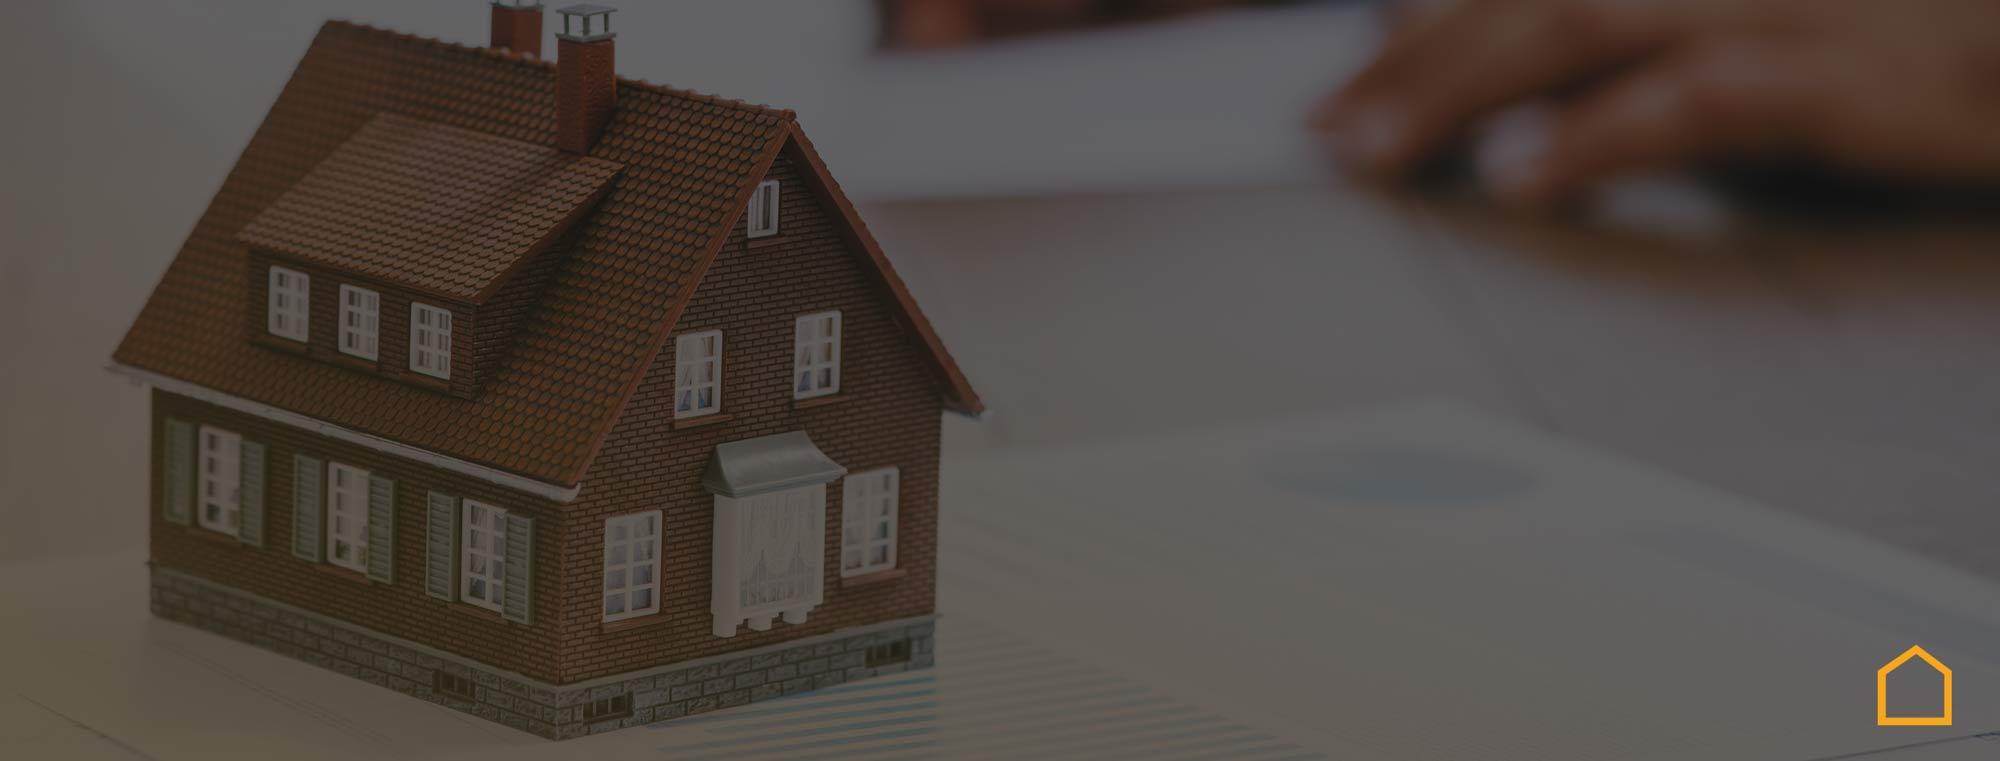 city immobilienmakler leasing